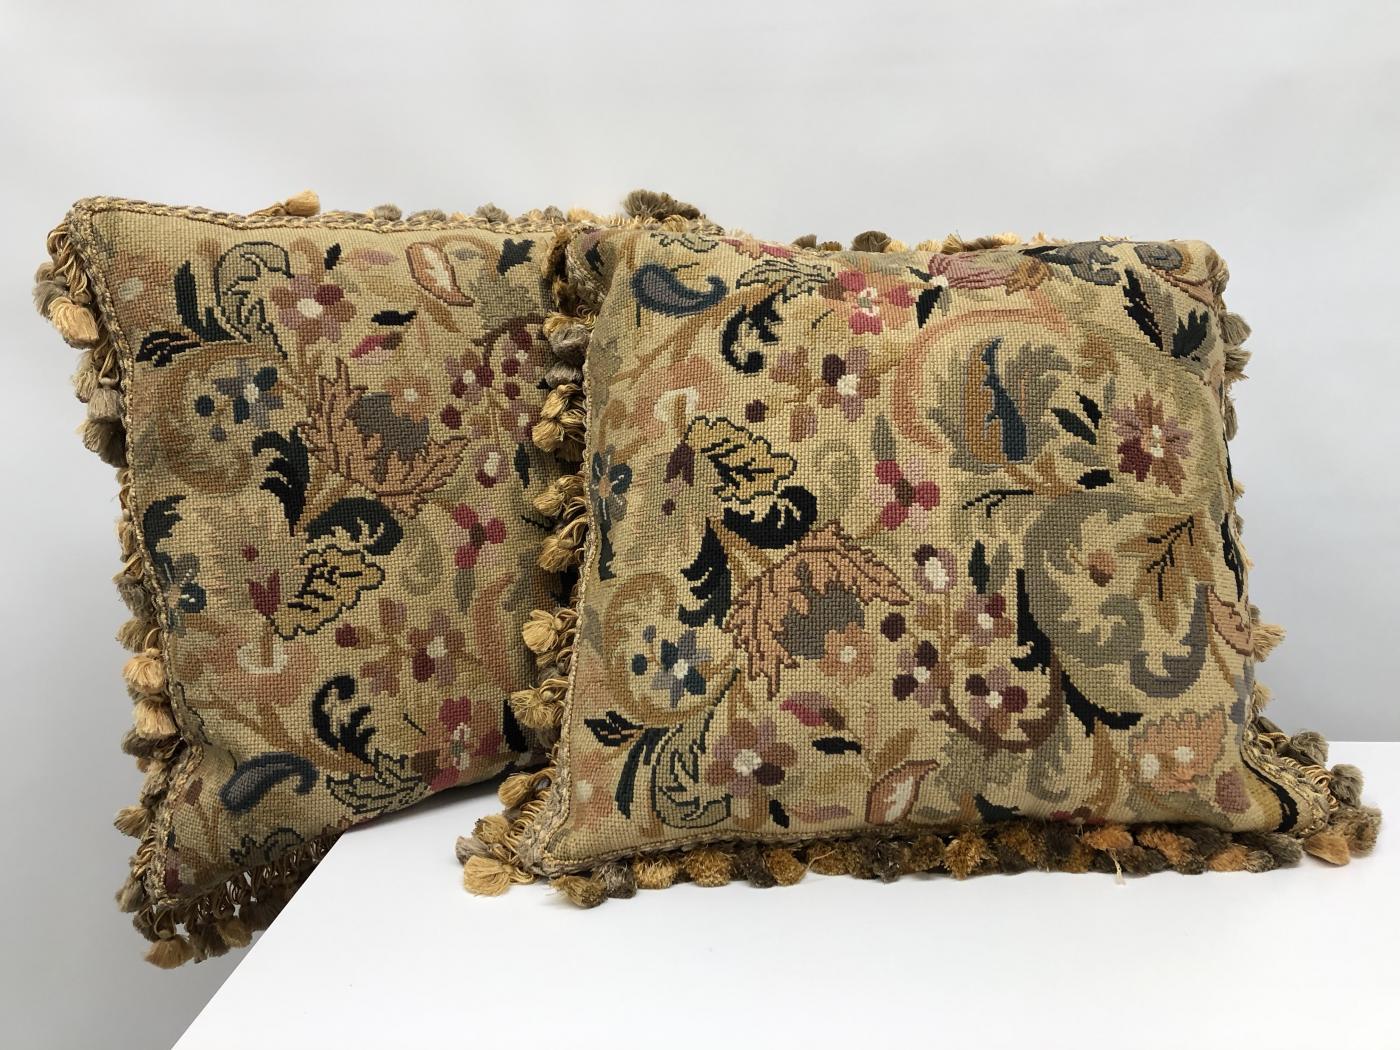 Pair of 19th century needlepoint pillows